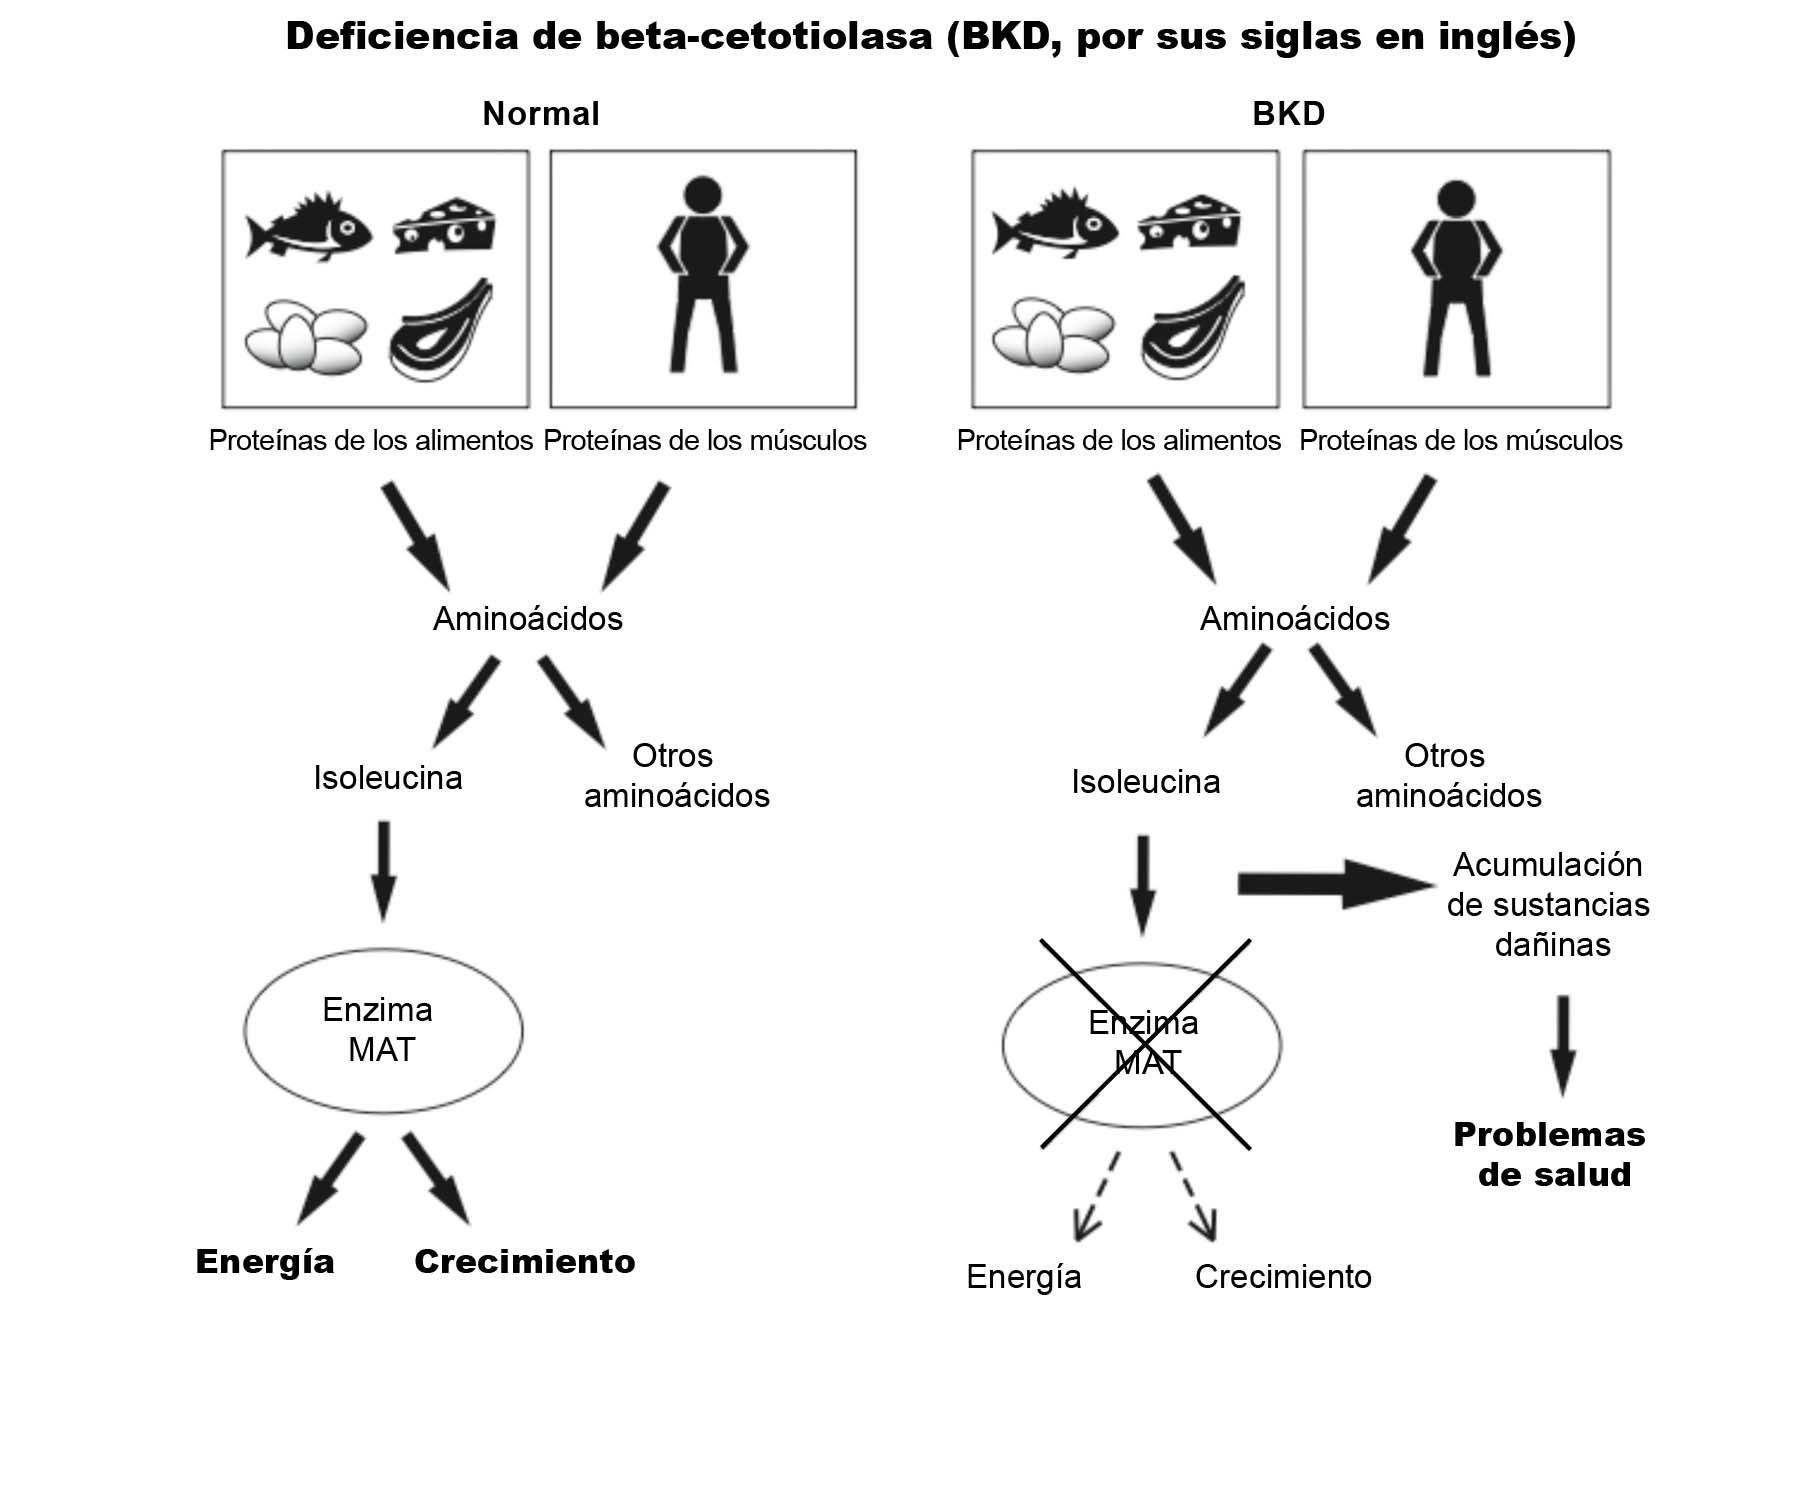 BKD Diagram